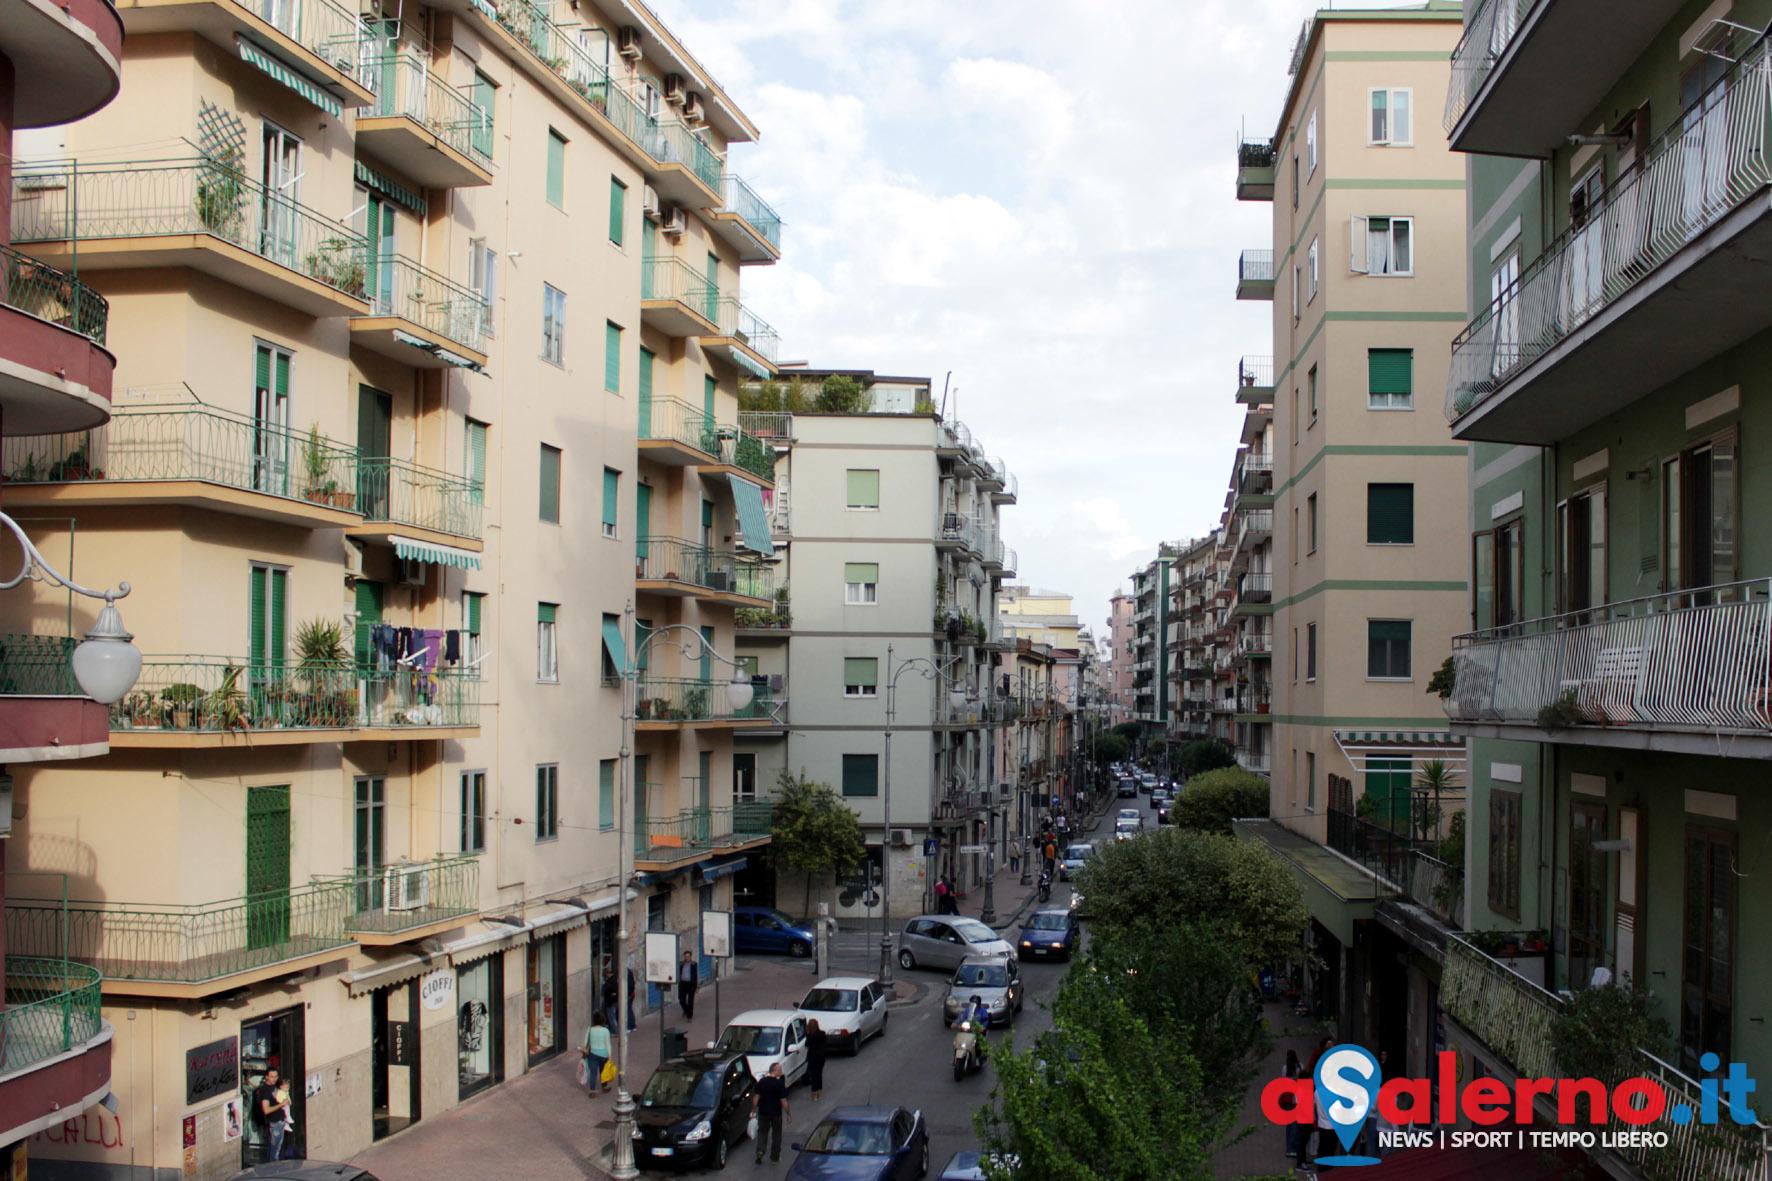 Salerno, Viaggio nei quartieri, Zona orientale